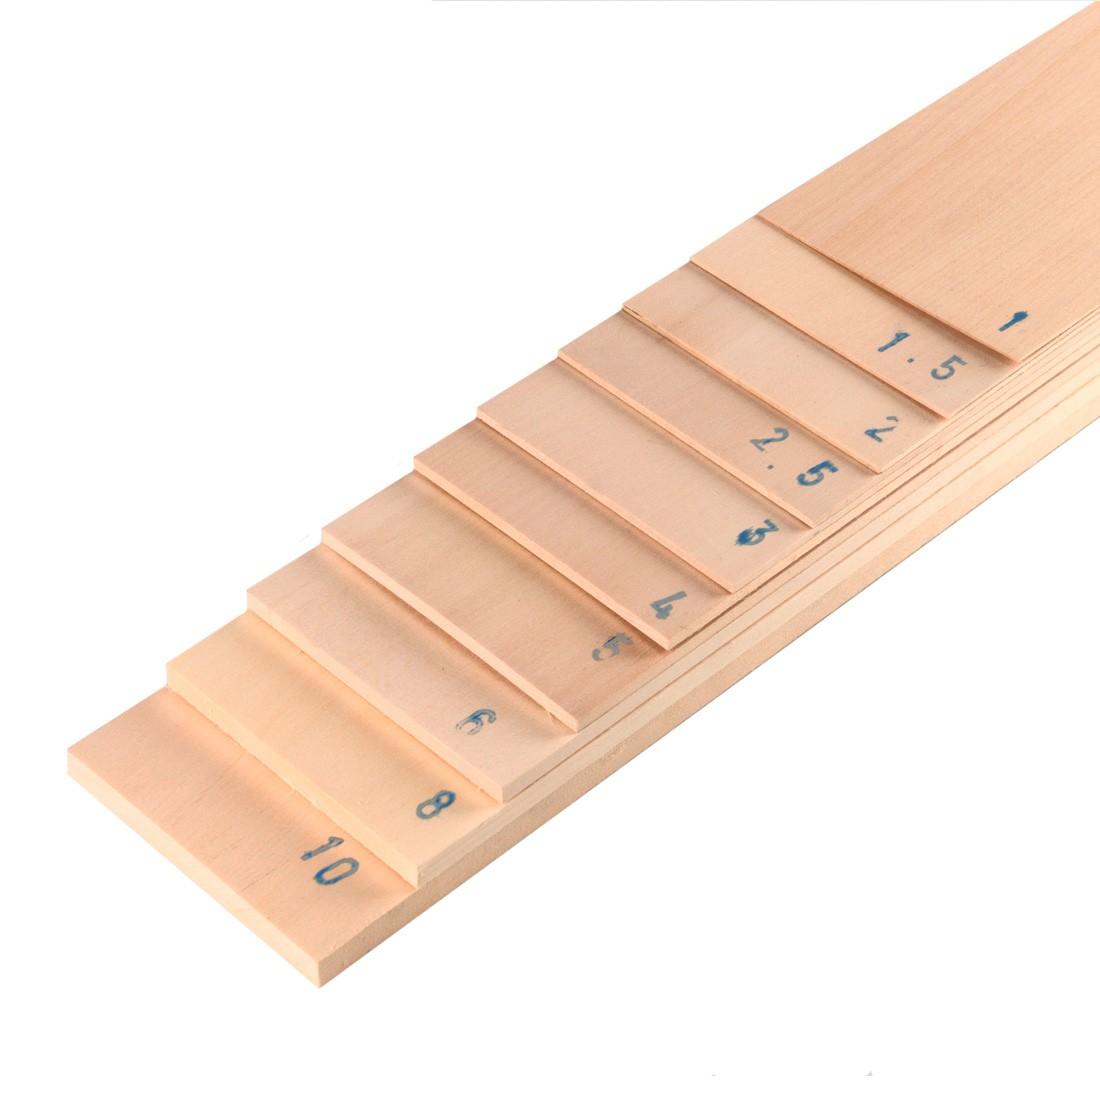 Limewood tablet mm.1x100x1000